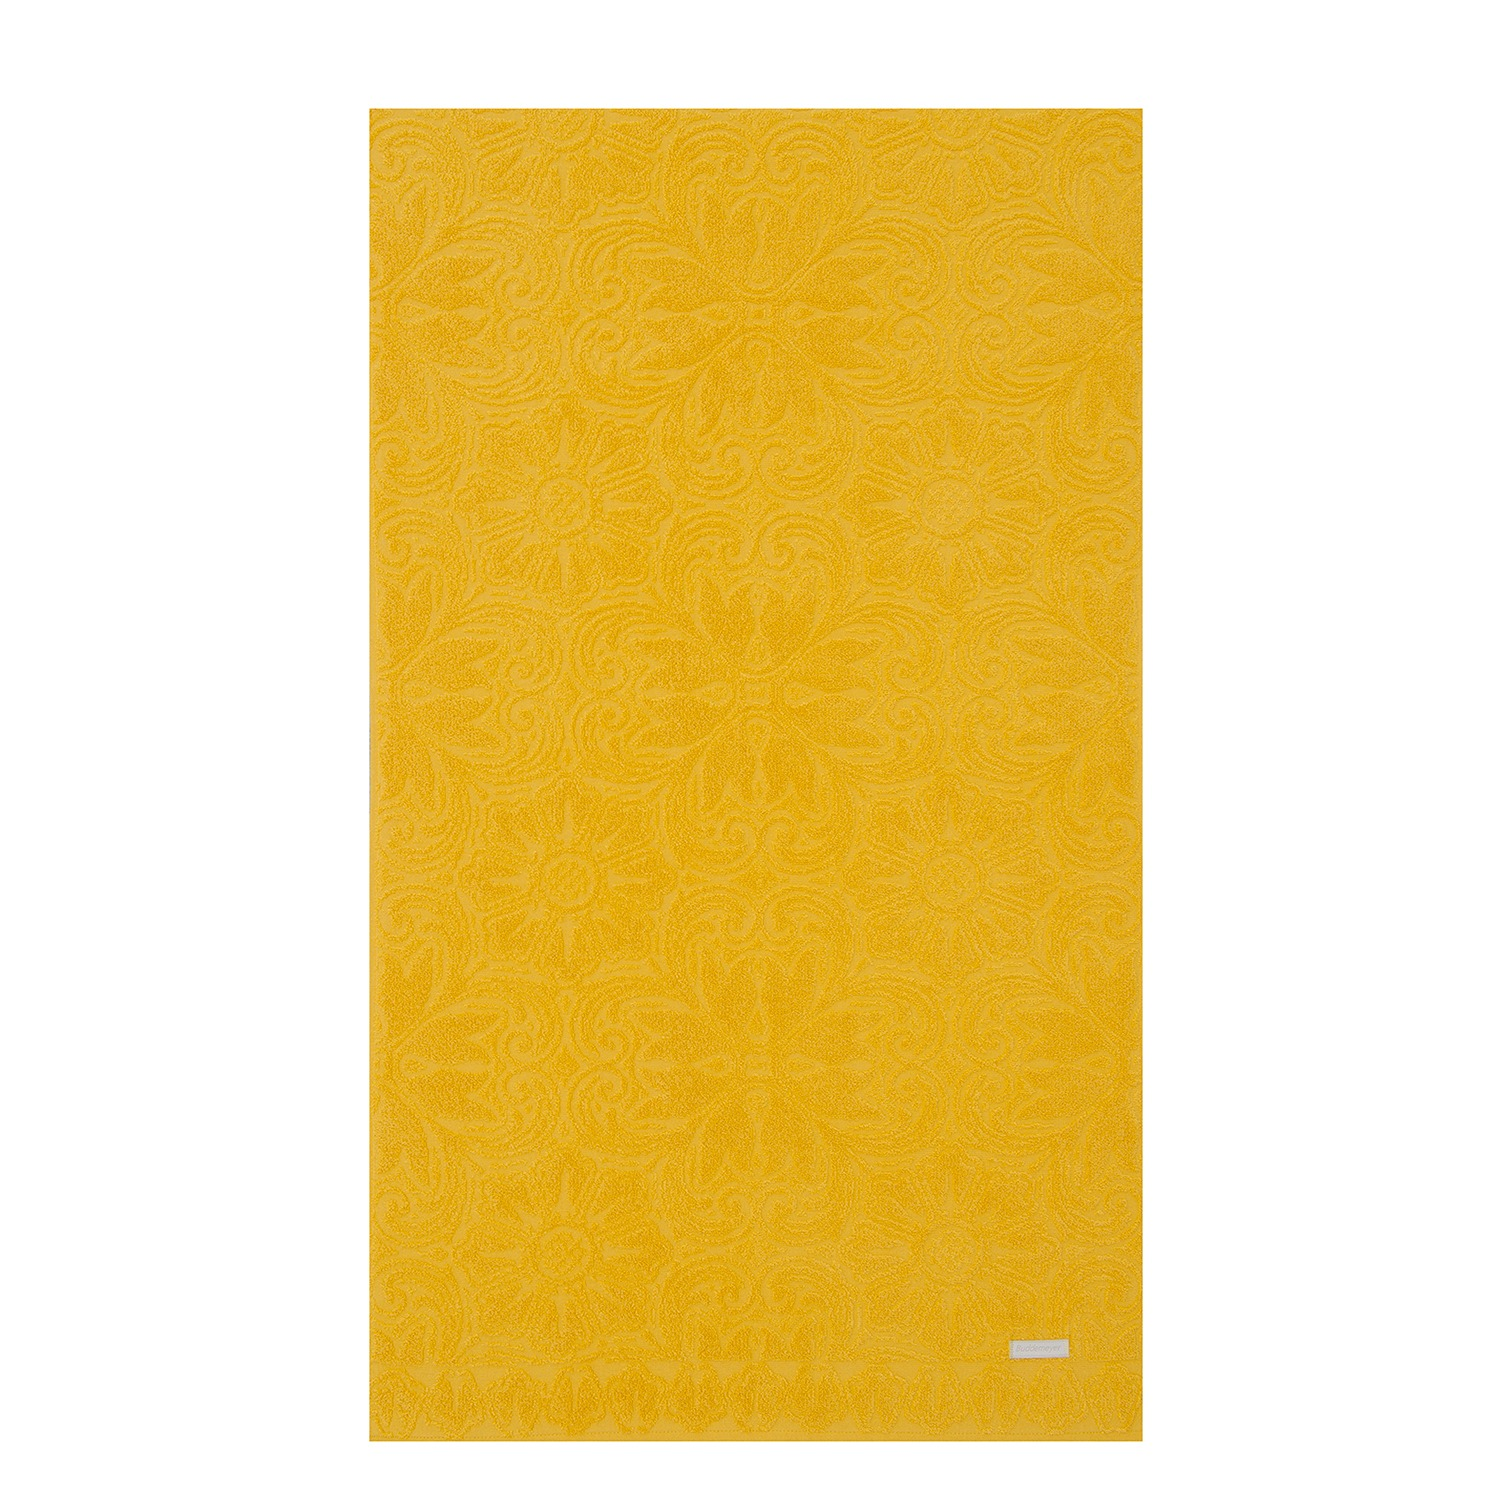 Toalha de Piso 48 x 70 cm 100 algodao Amarelo - Buddemeyer